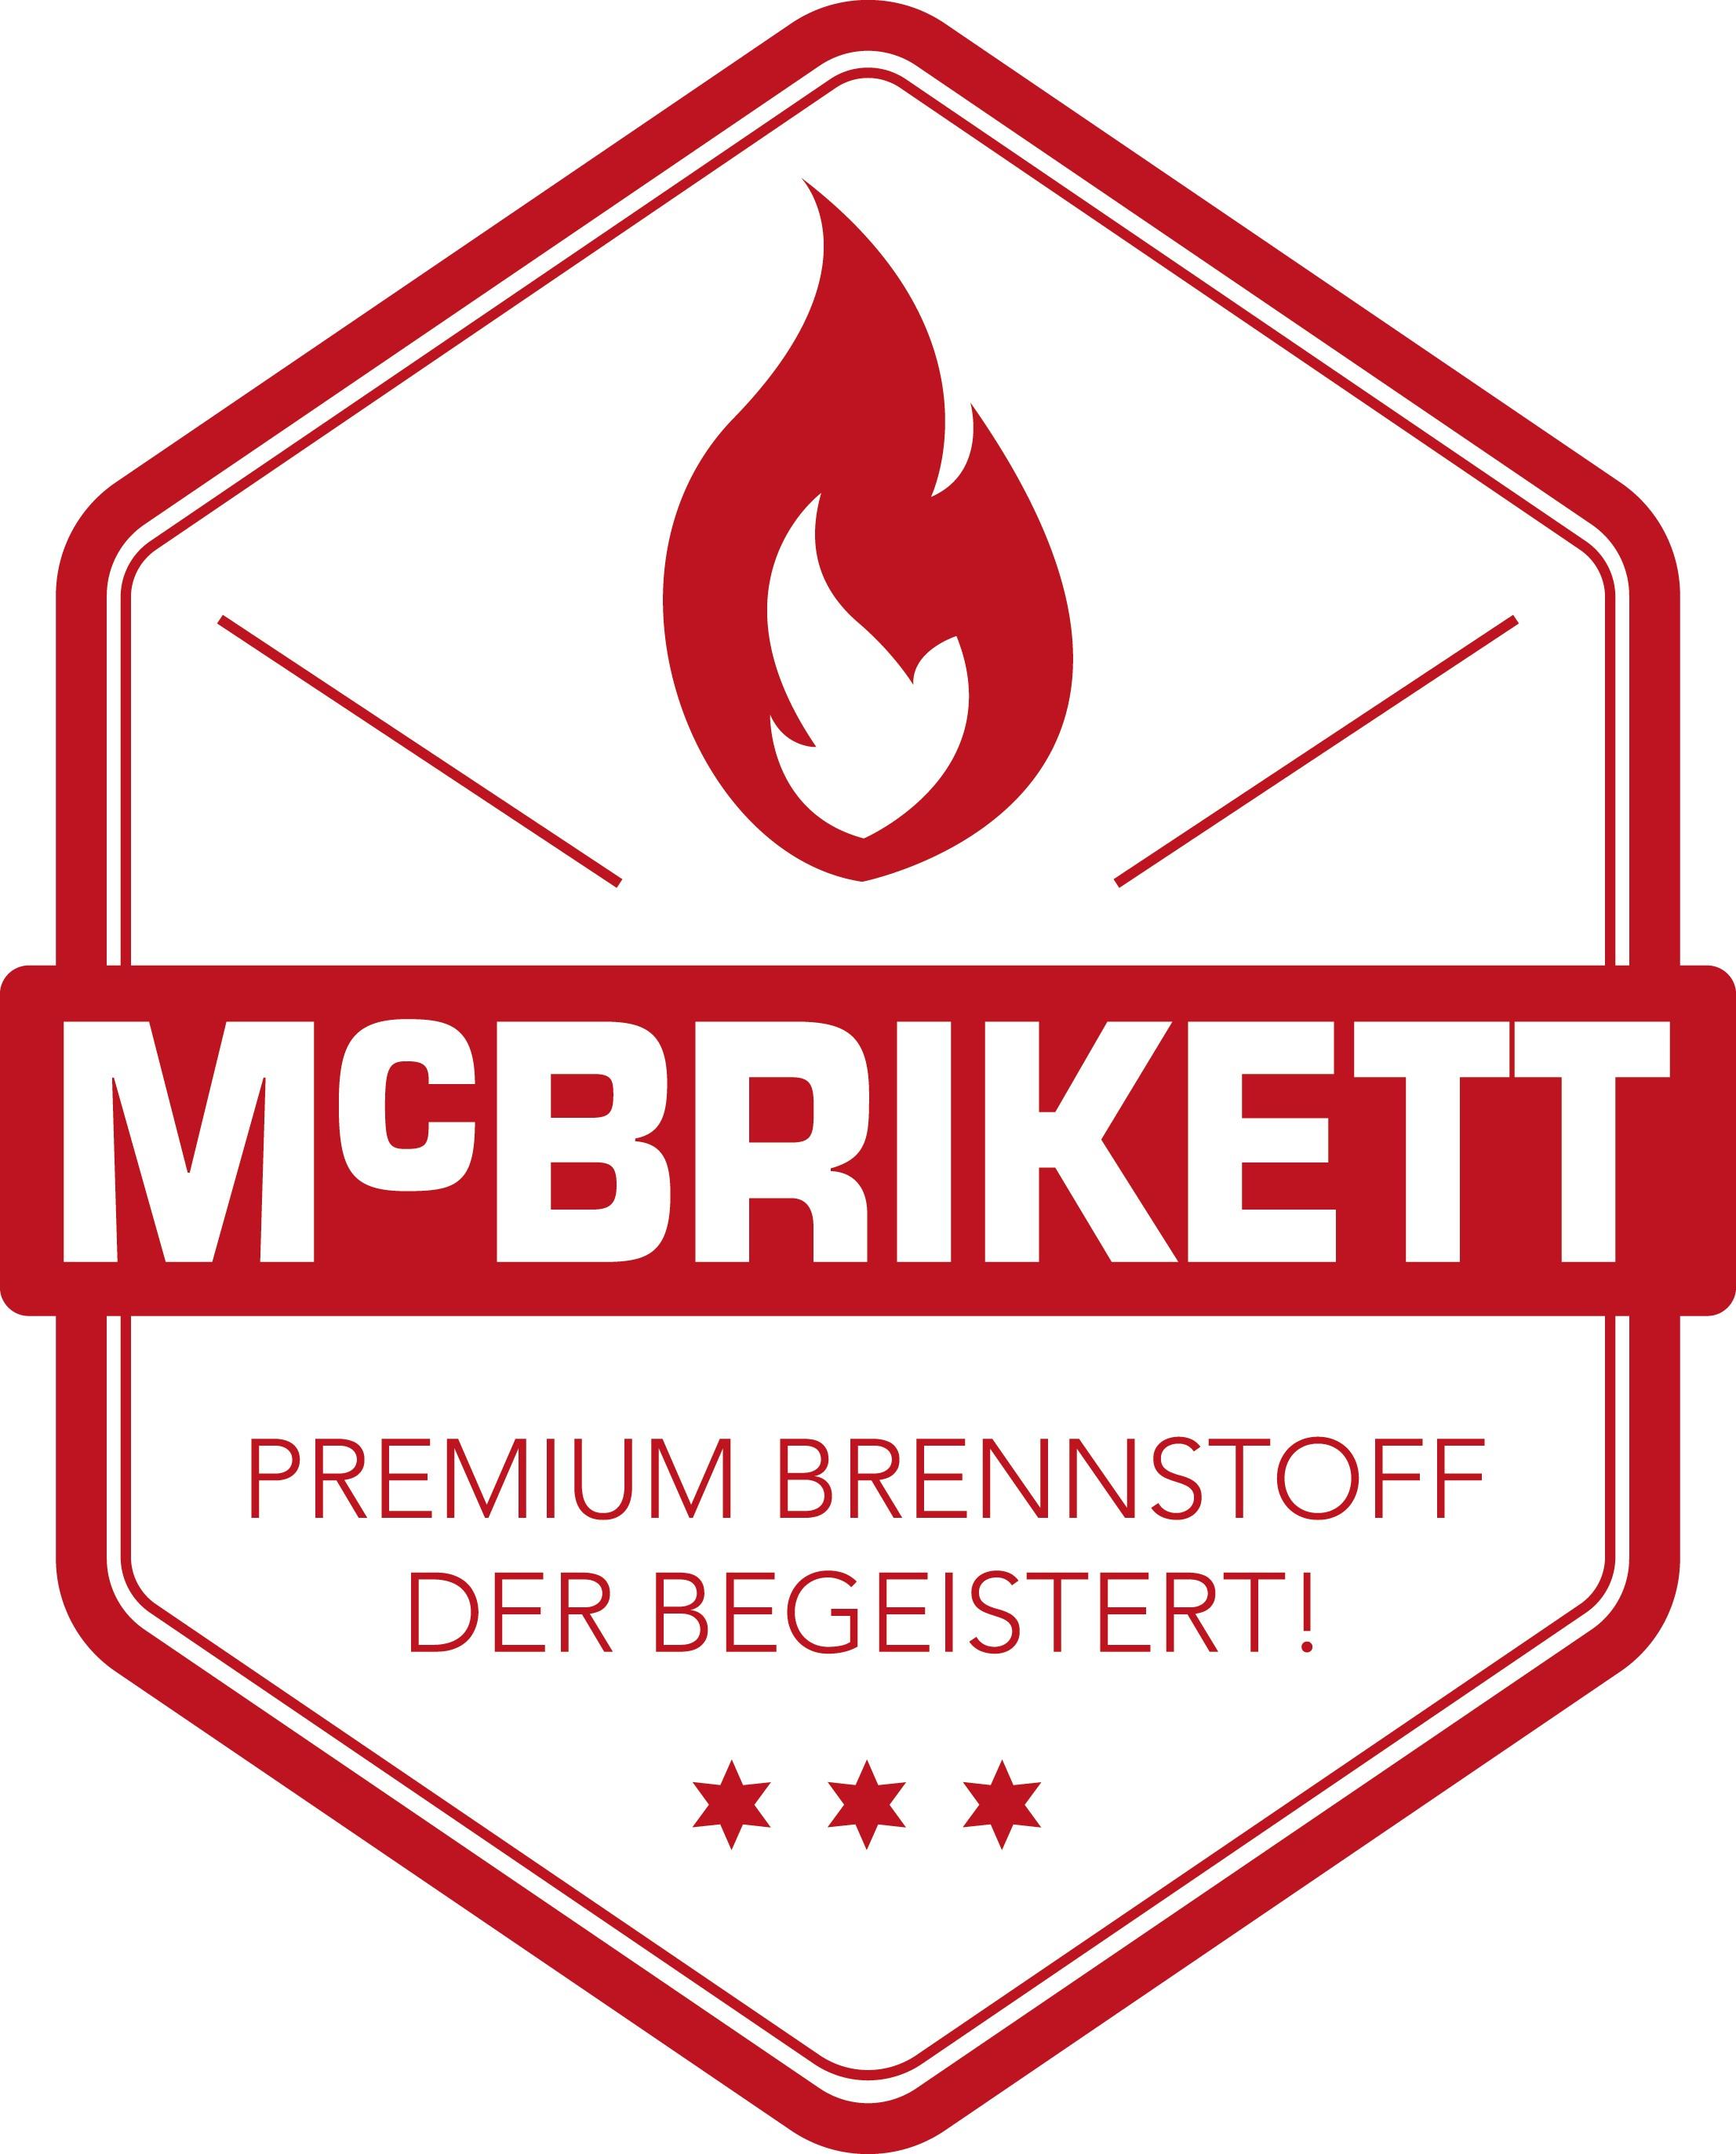 McBrikett